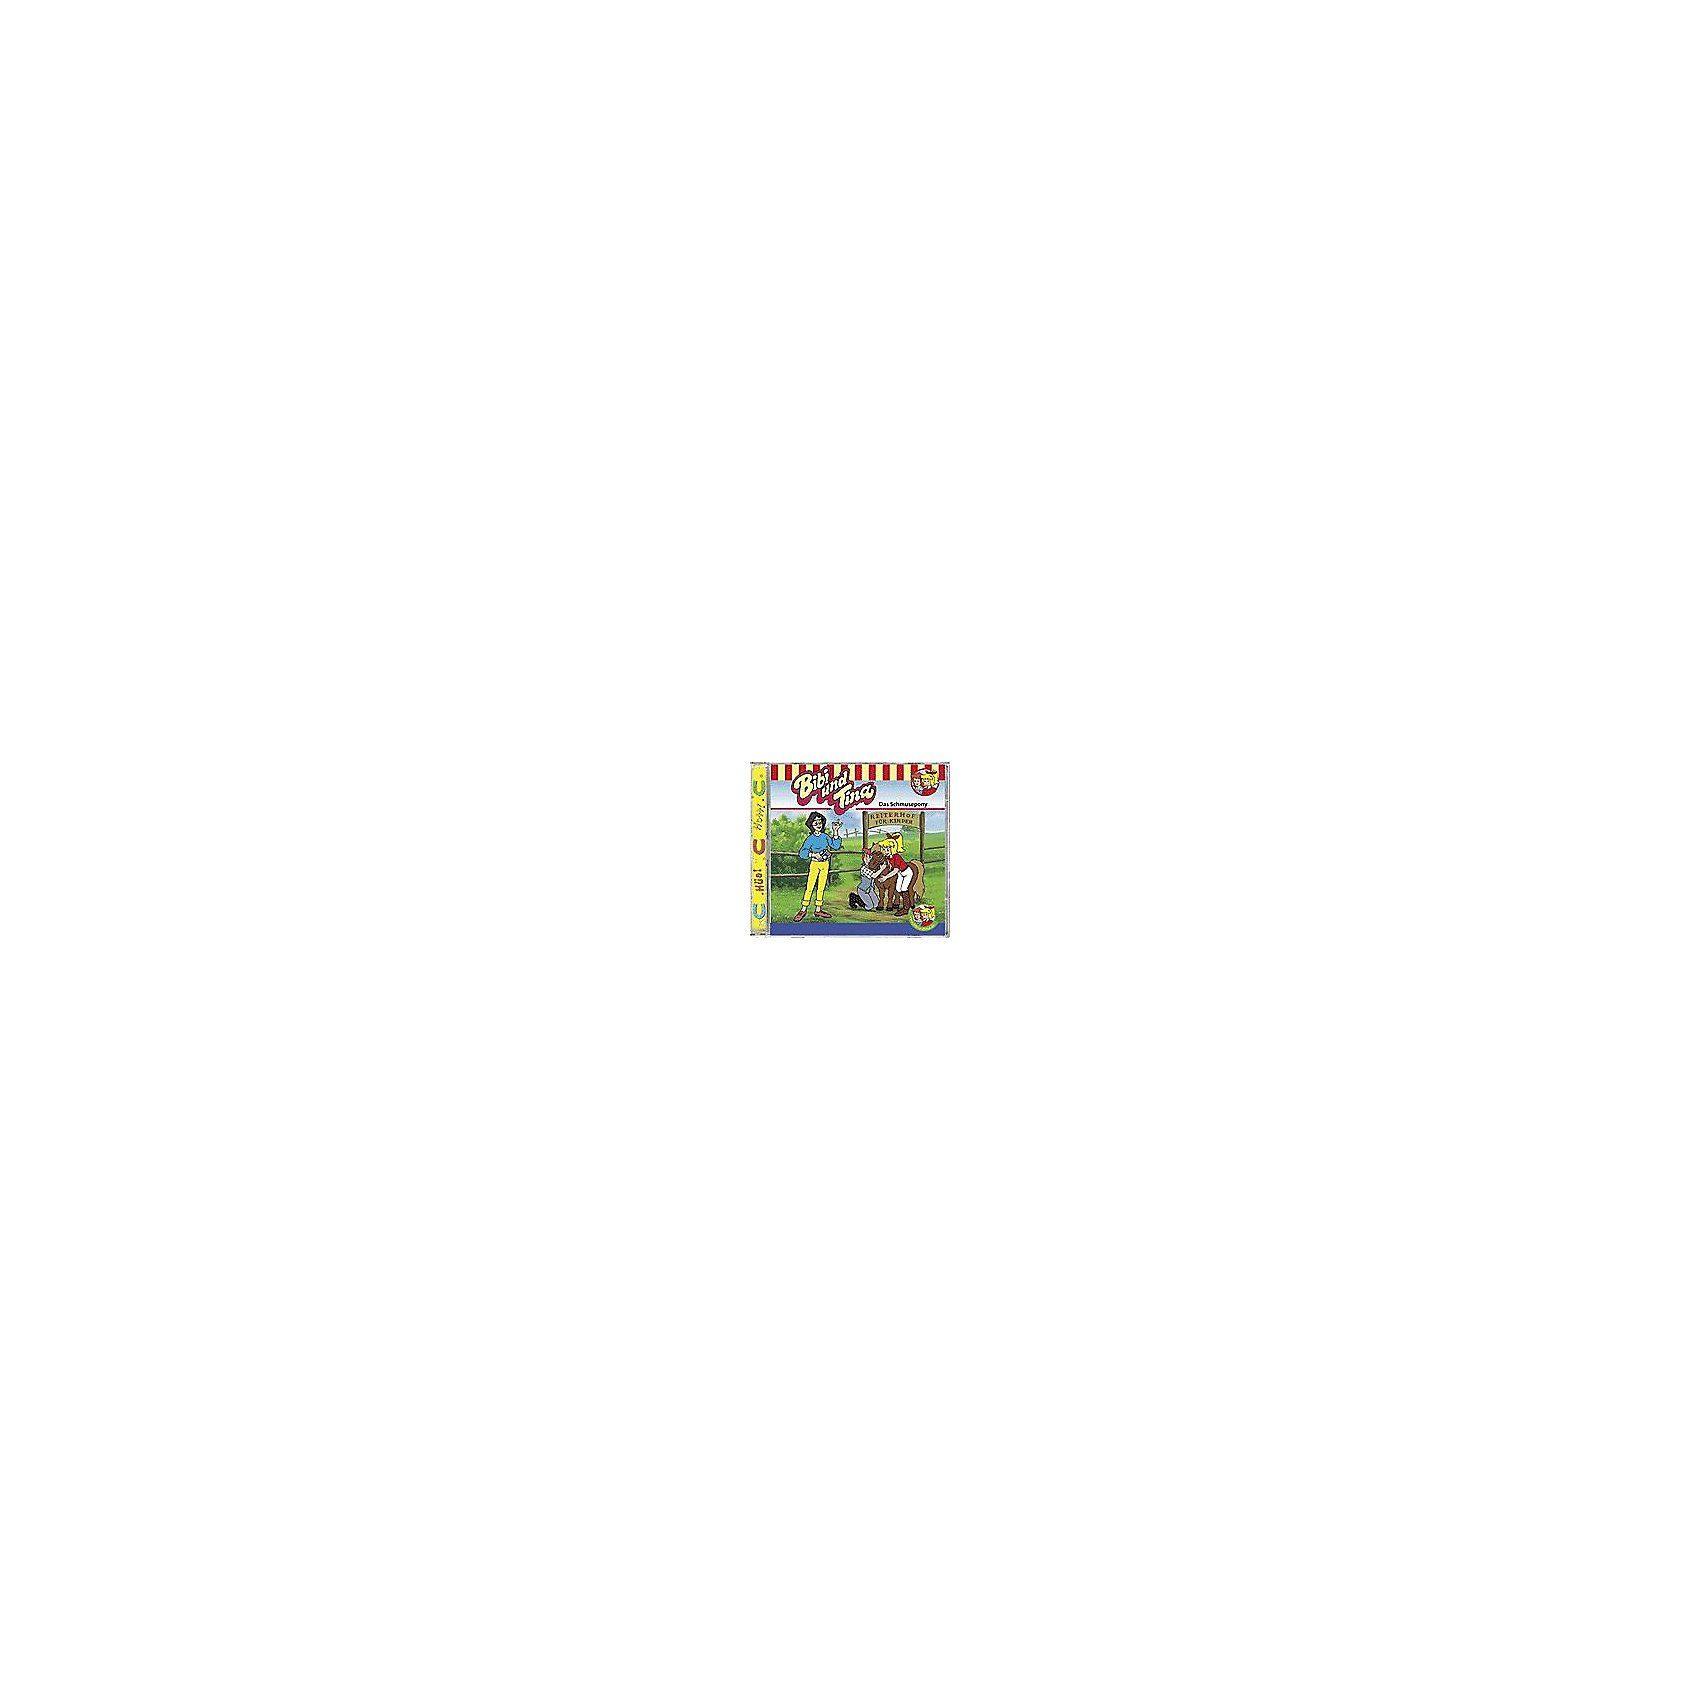 Kiddinx CD Bibi und Tina 32 (Das Schmusepony)